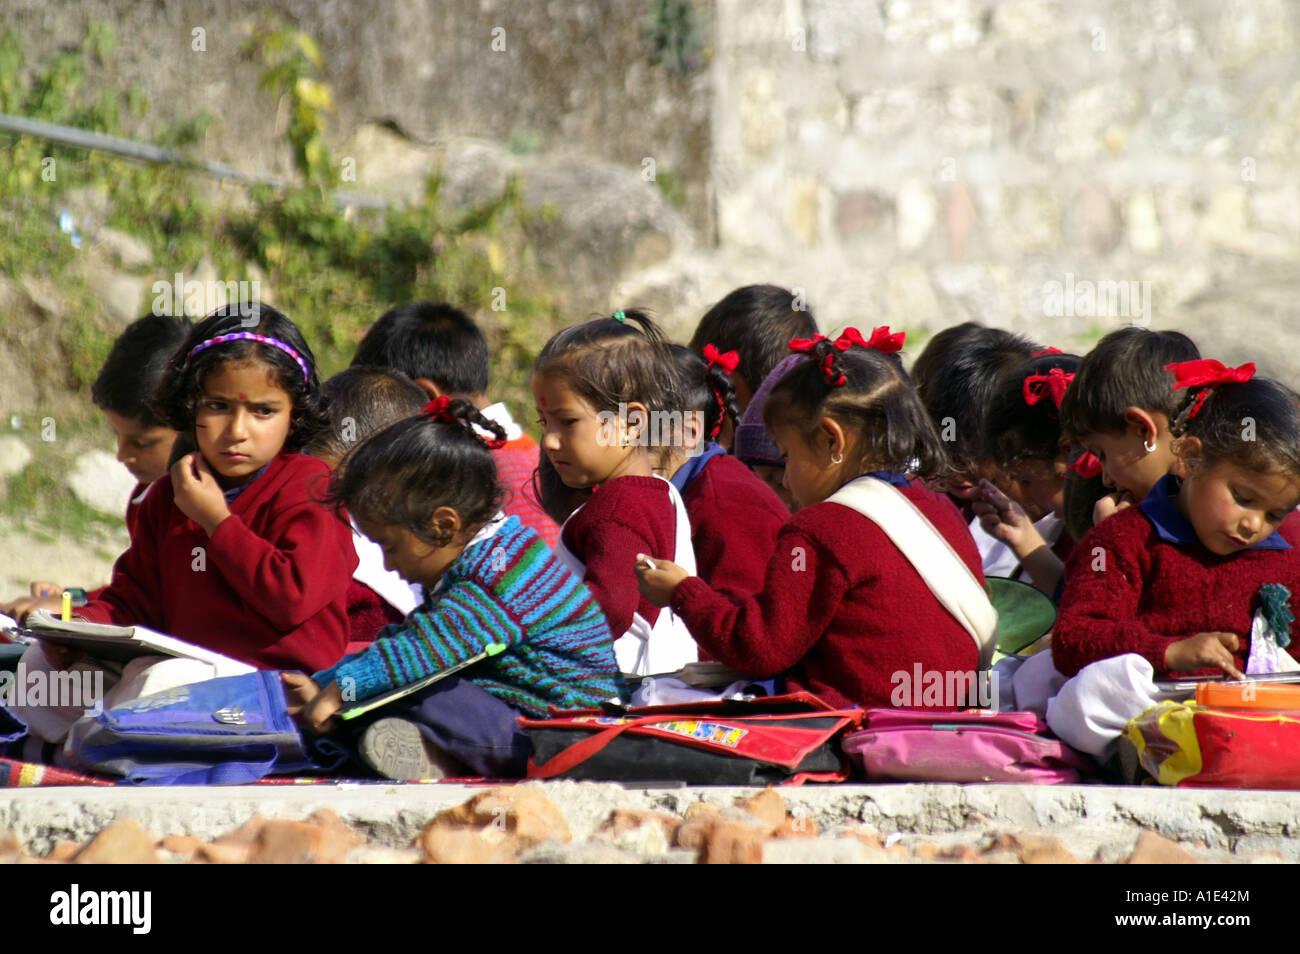 Group of young children schoolboys schoolgirls indian kids sitting writting exam outdoors school yard, Bhagsunag, - Stock Image